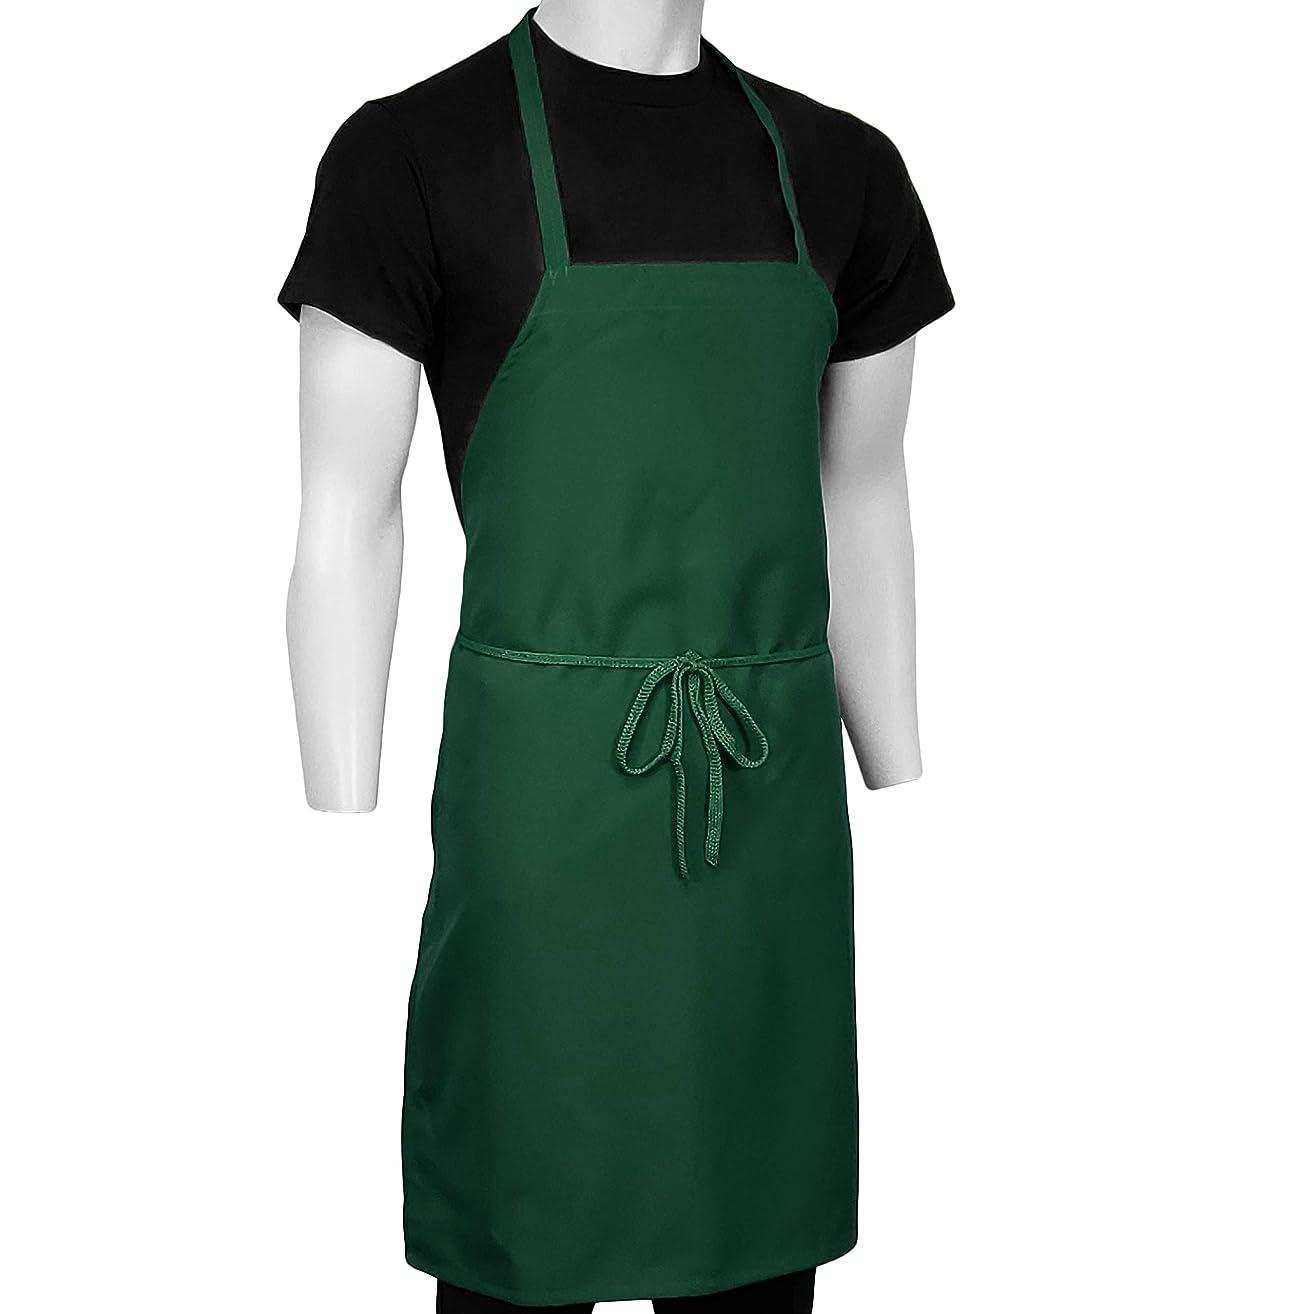 ChefsCloset Pack of 12 Bib Aprons, No Pocket, 100% Easy Wash Polyester (Hunter)